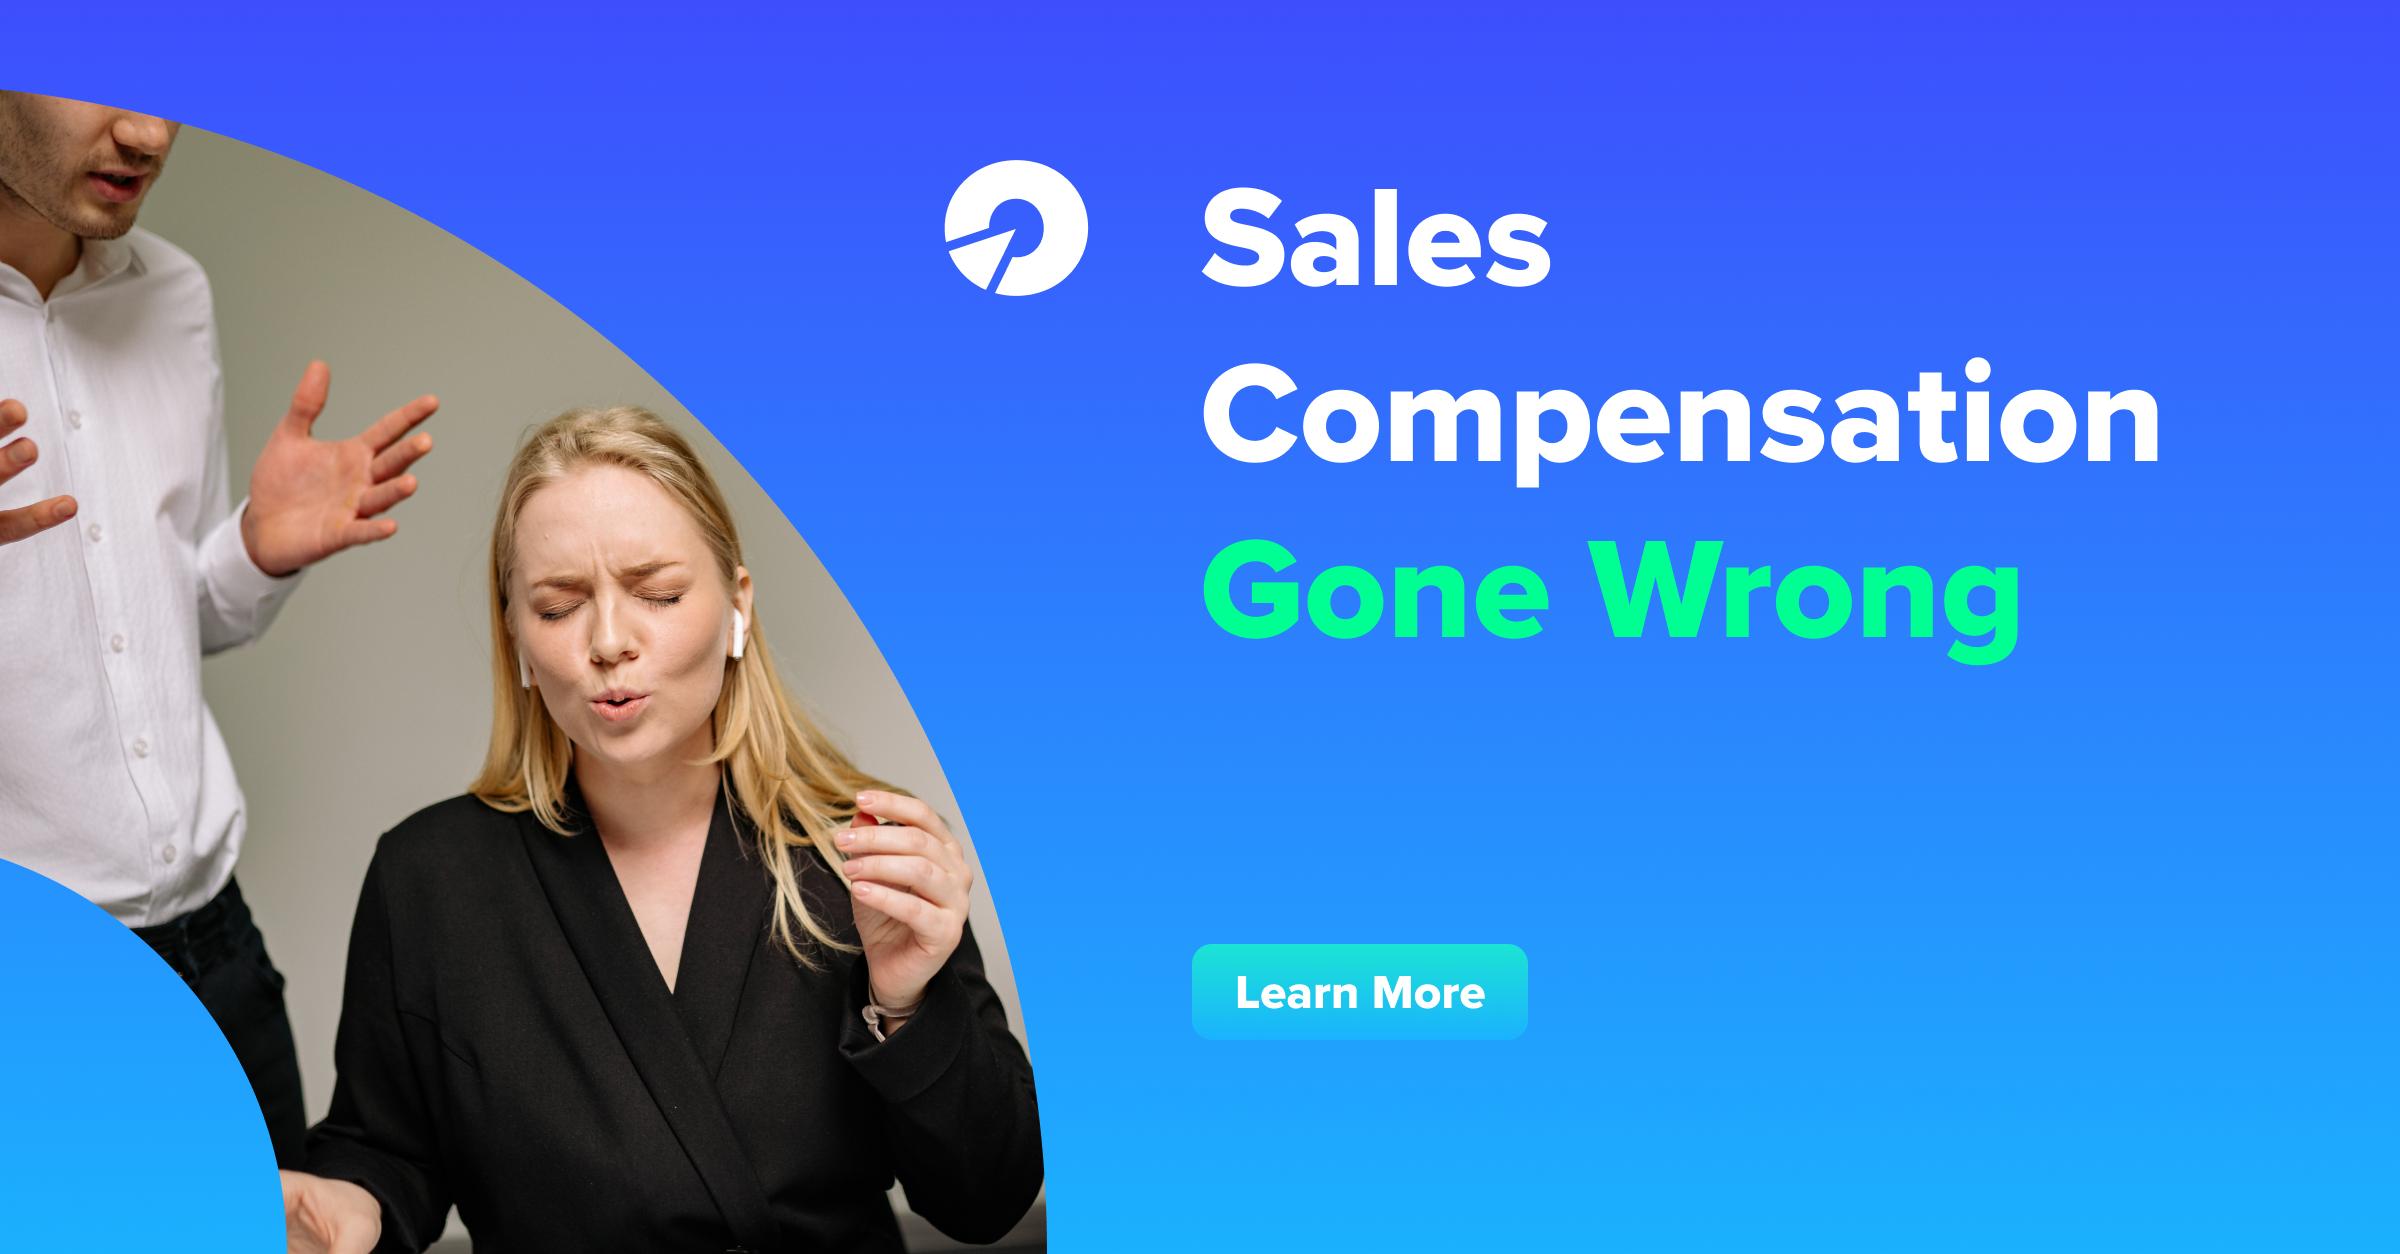 Sales Compensation Gone Wrong